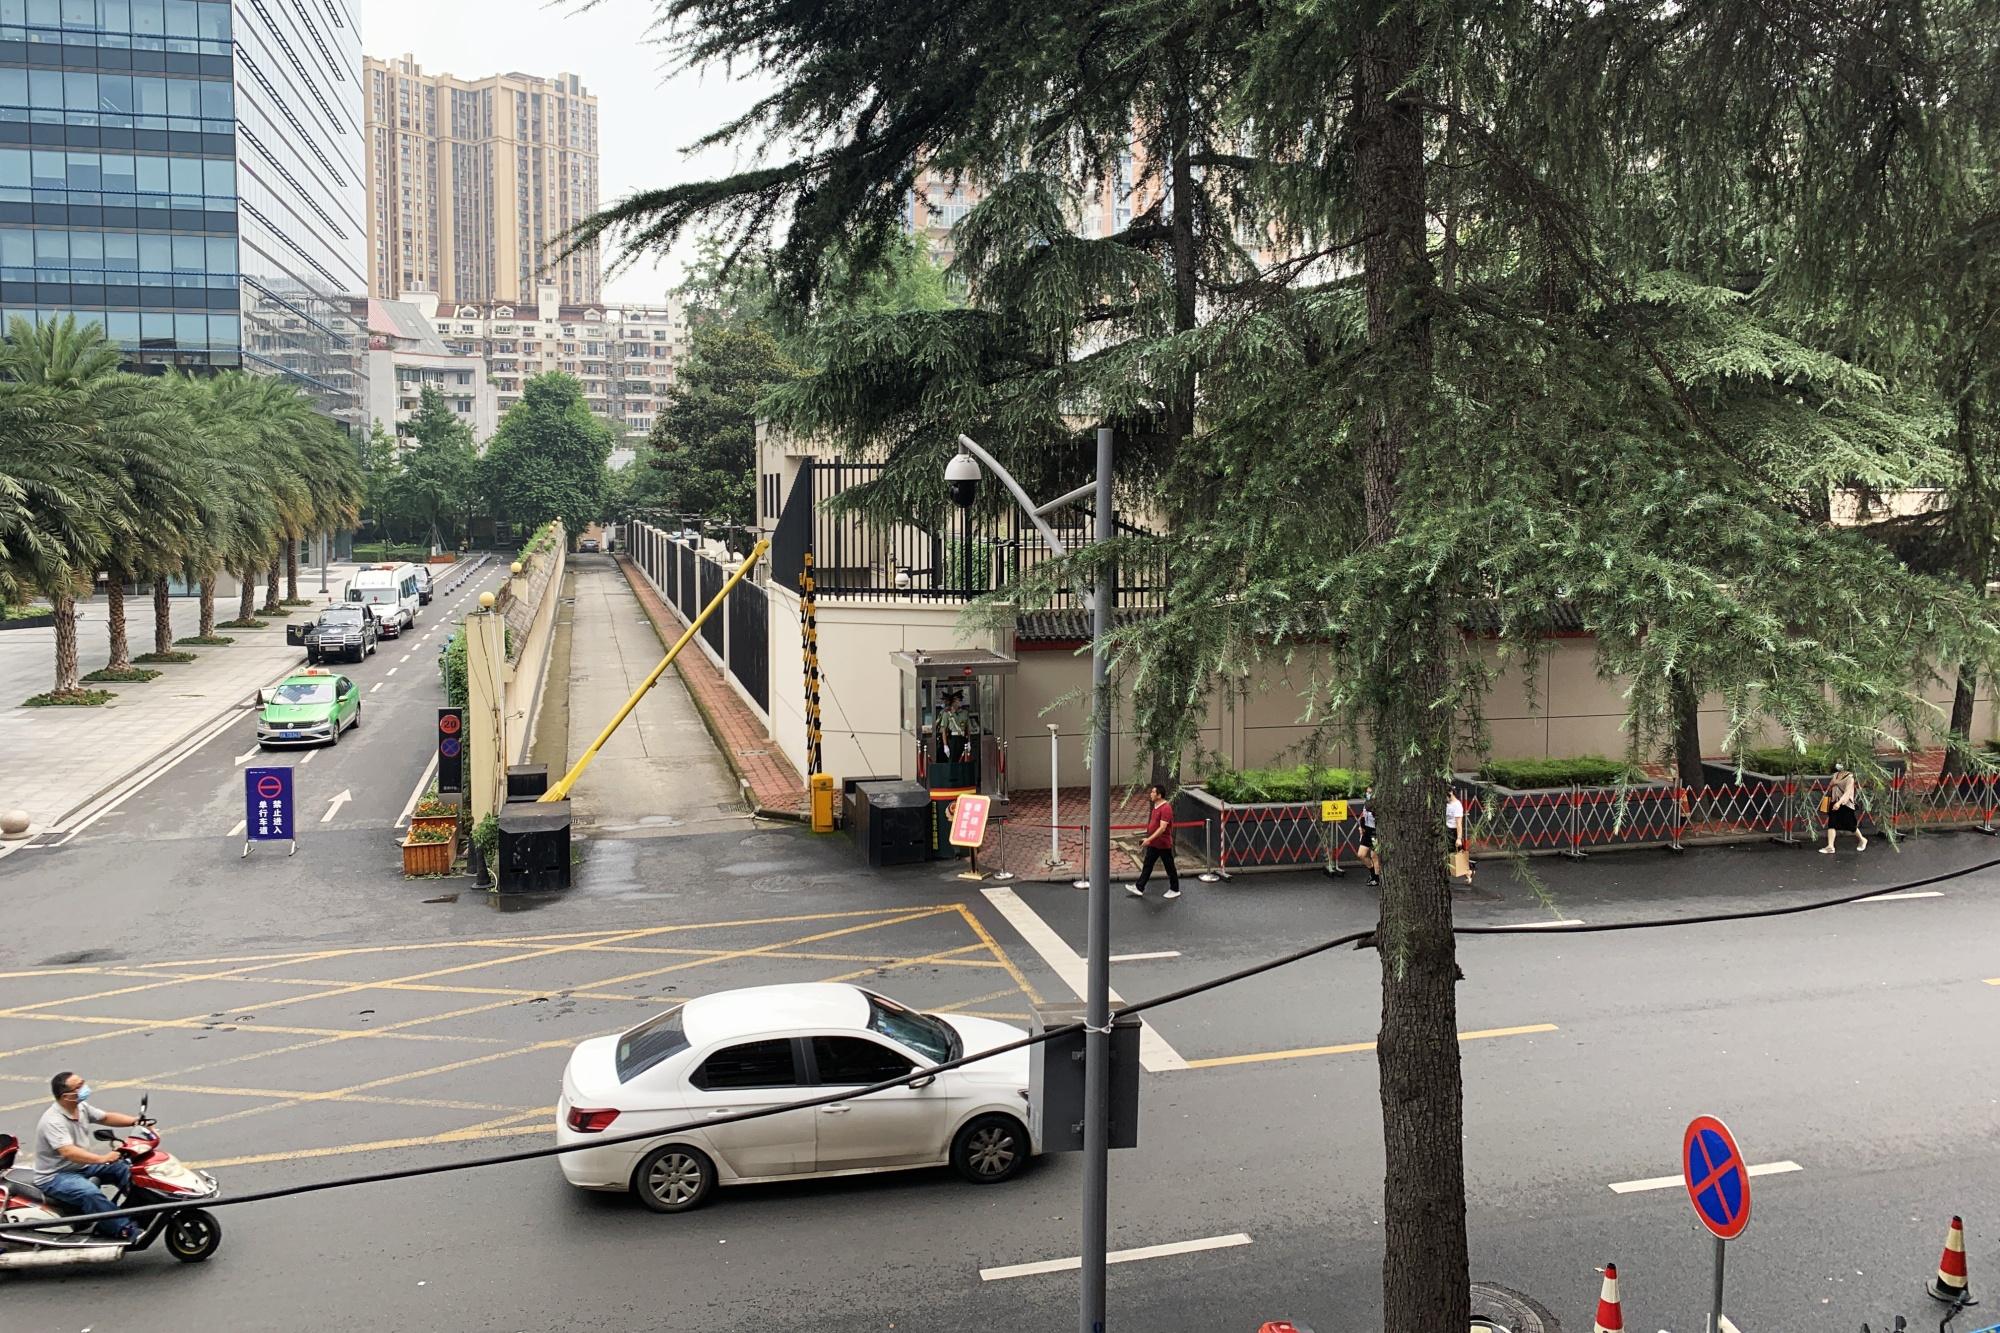 China Closes U.S. Consulate In Chengdu, After Washington Closes Beijing's Consulate In Houston